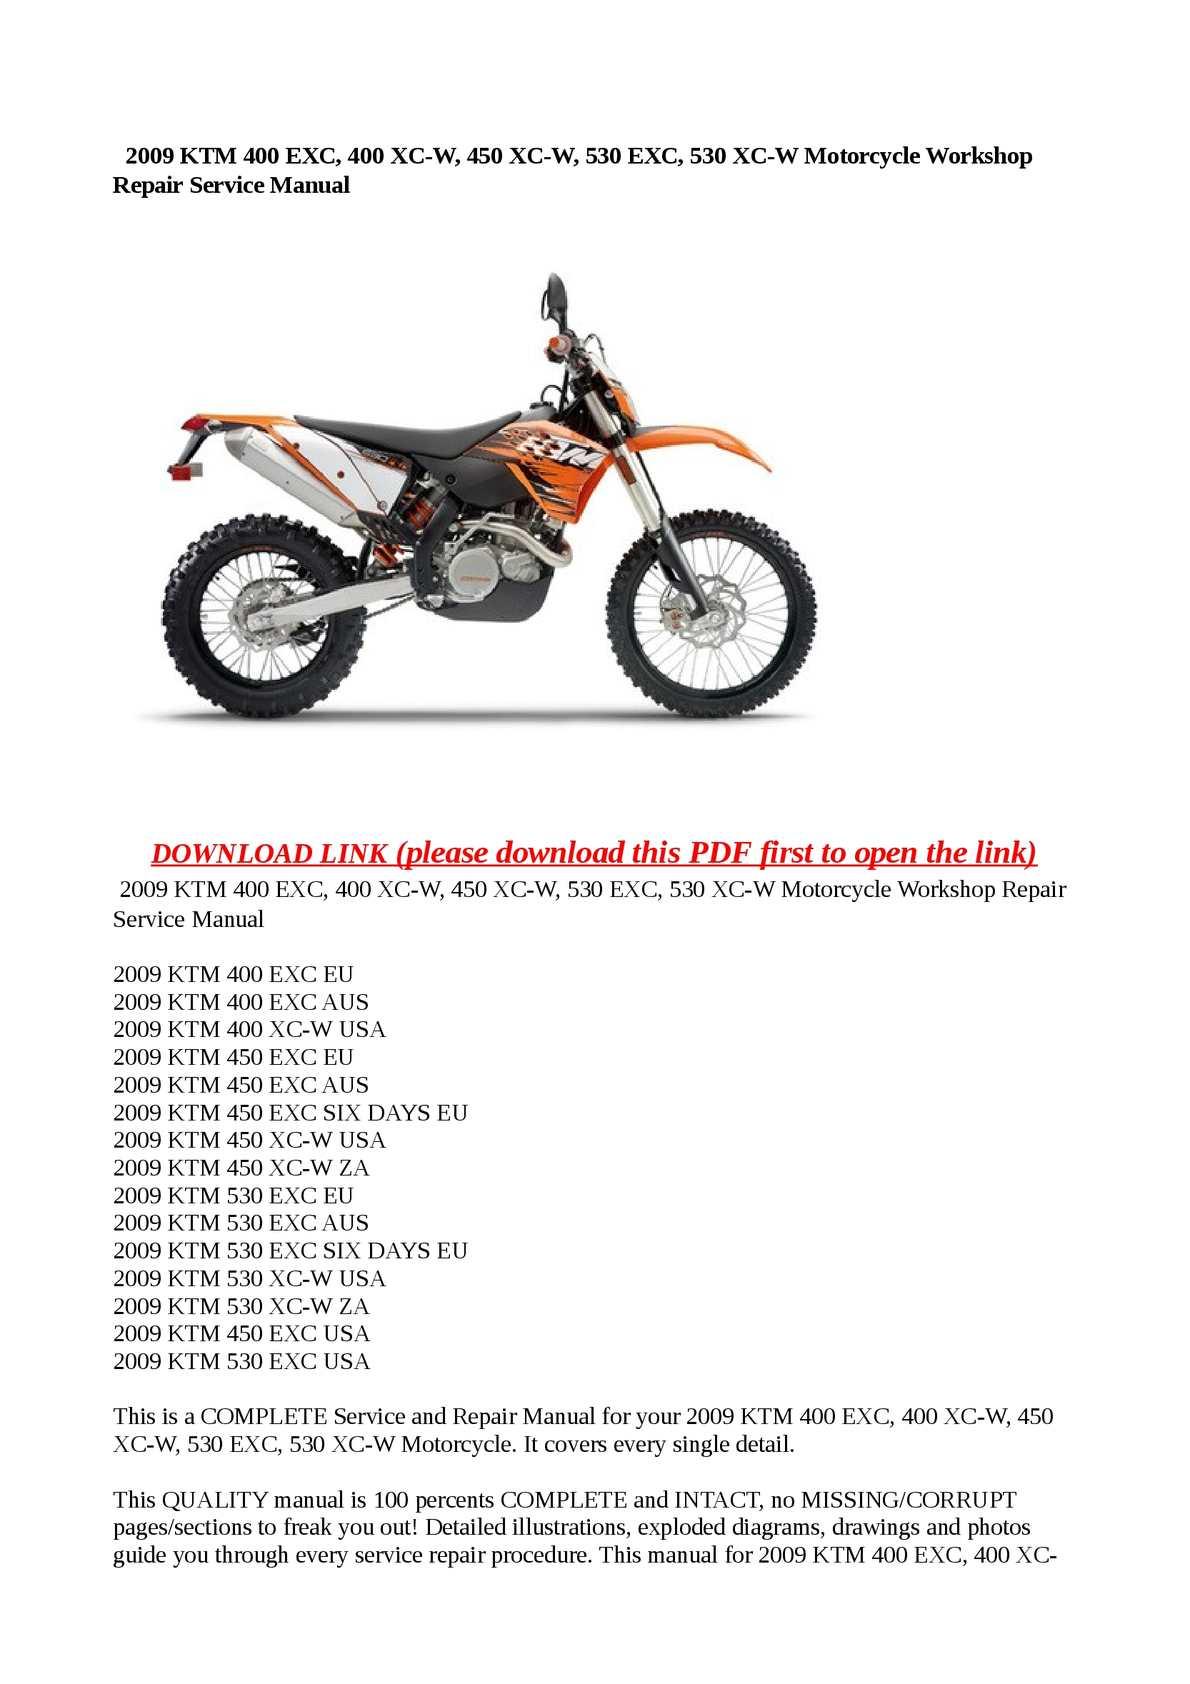 calam o 2009 ktm 400 exc 400 xc w 450 xc w 530 exc 530 xc w rh calameo com 2012 KTM 450 EXC 2008 KTM 450 EXC